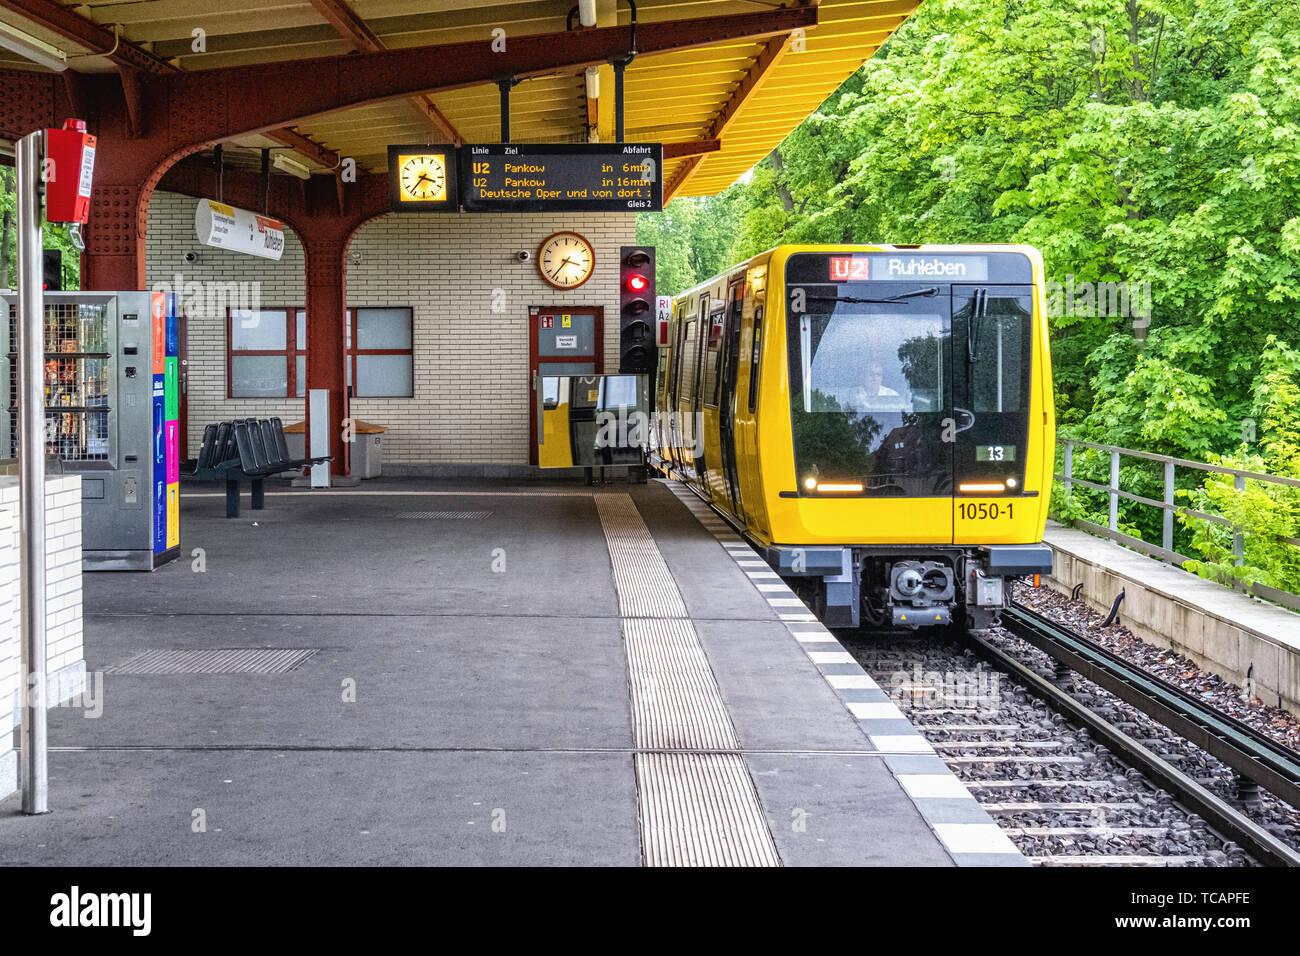 U-Bahn Ruhleben underground railway station is the western terminus of the U 2 line in Westend district, Berlin. Train, Platform & rail tracks - Stock Image